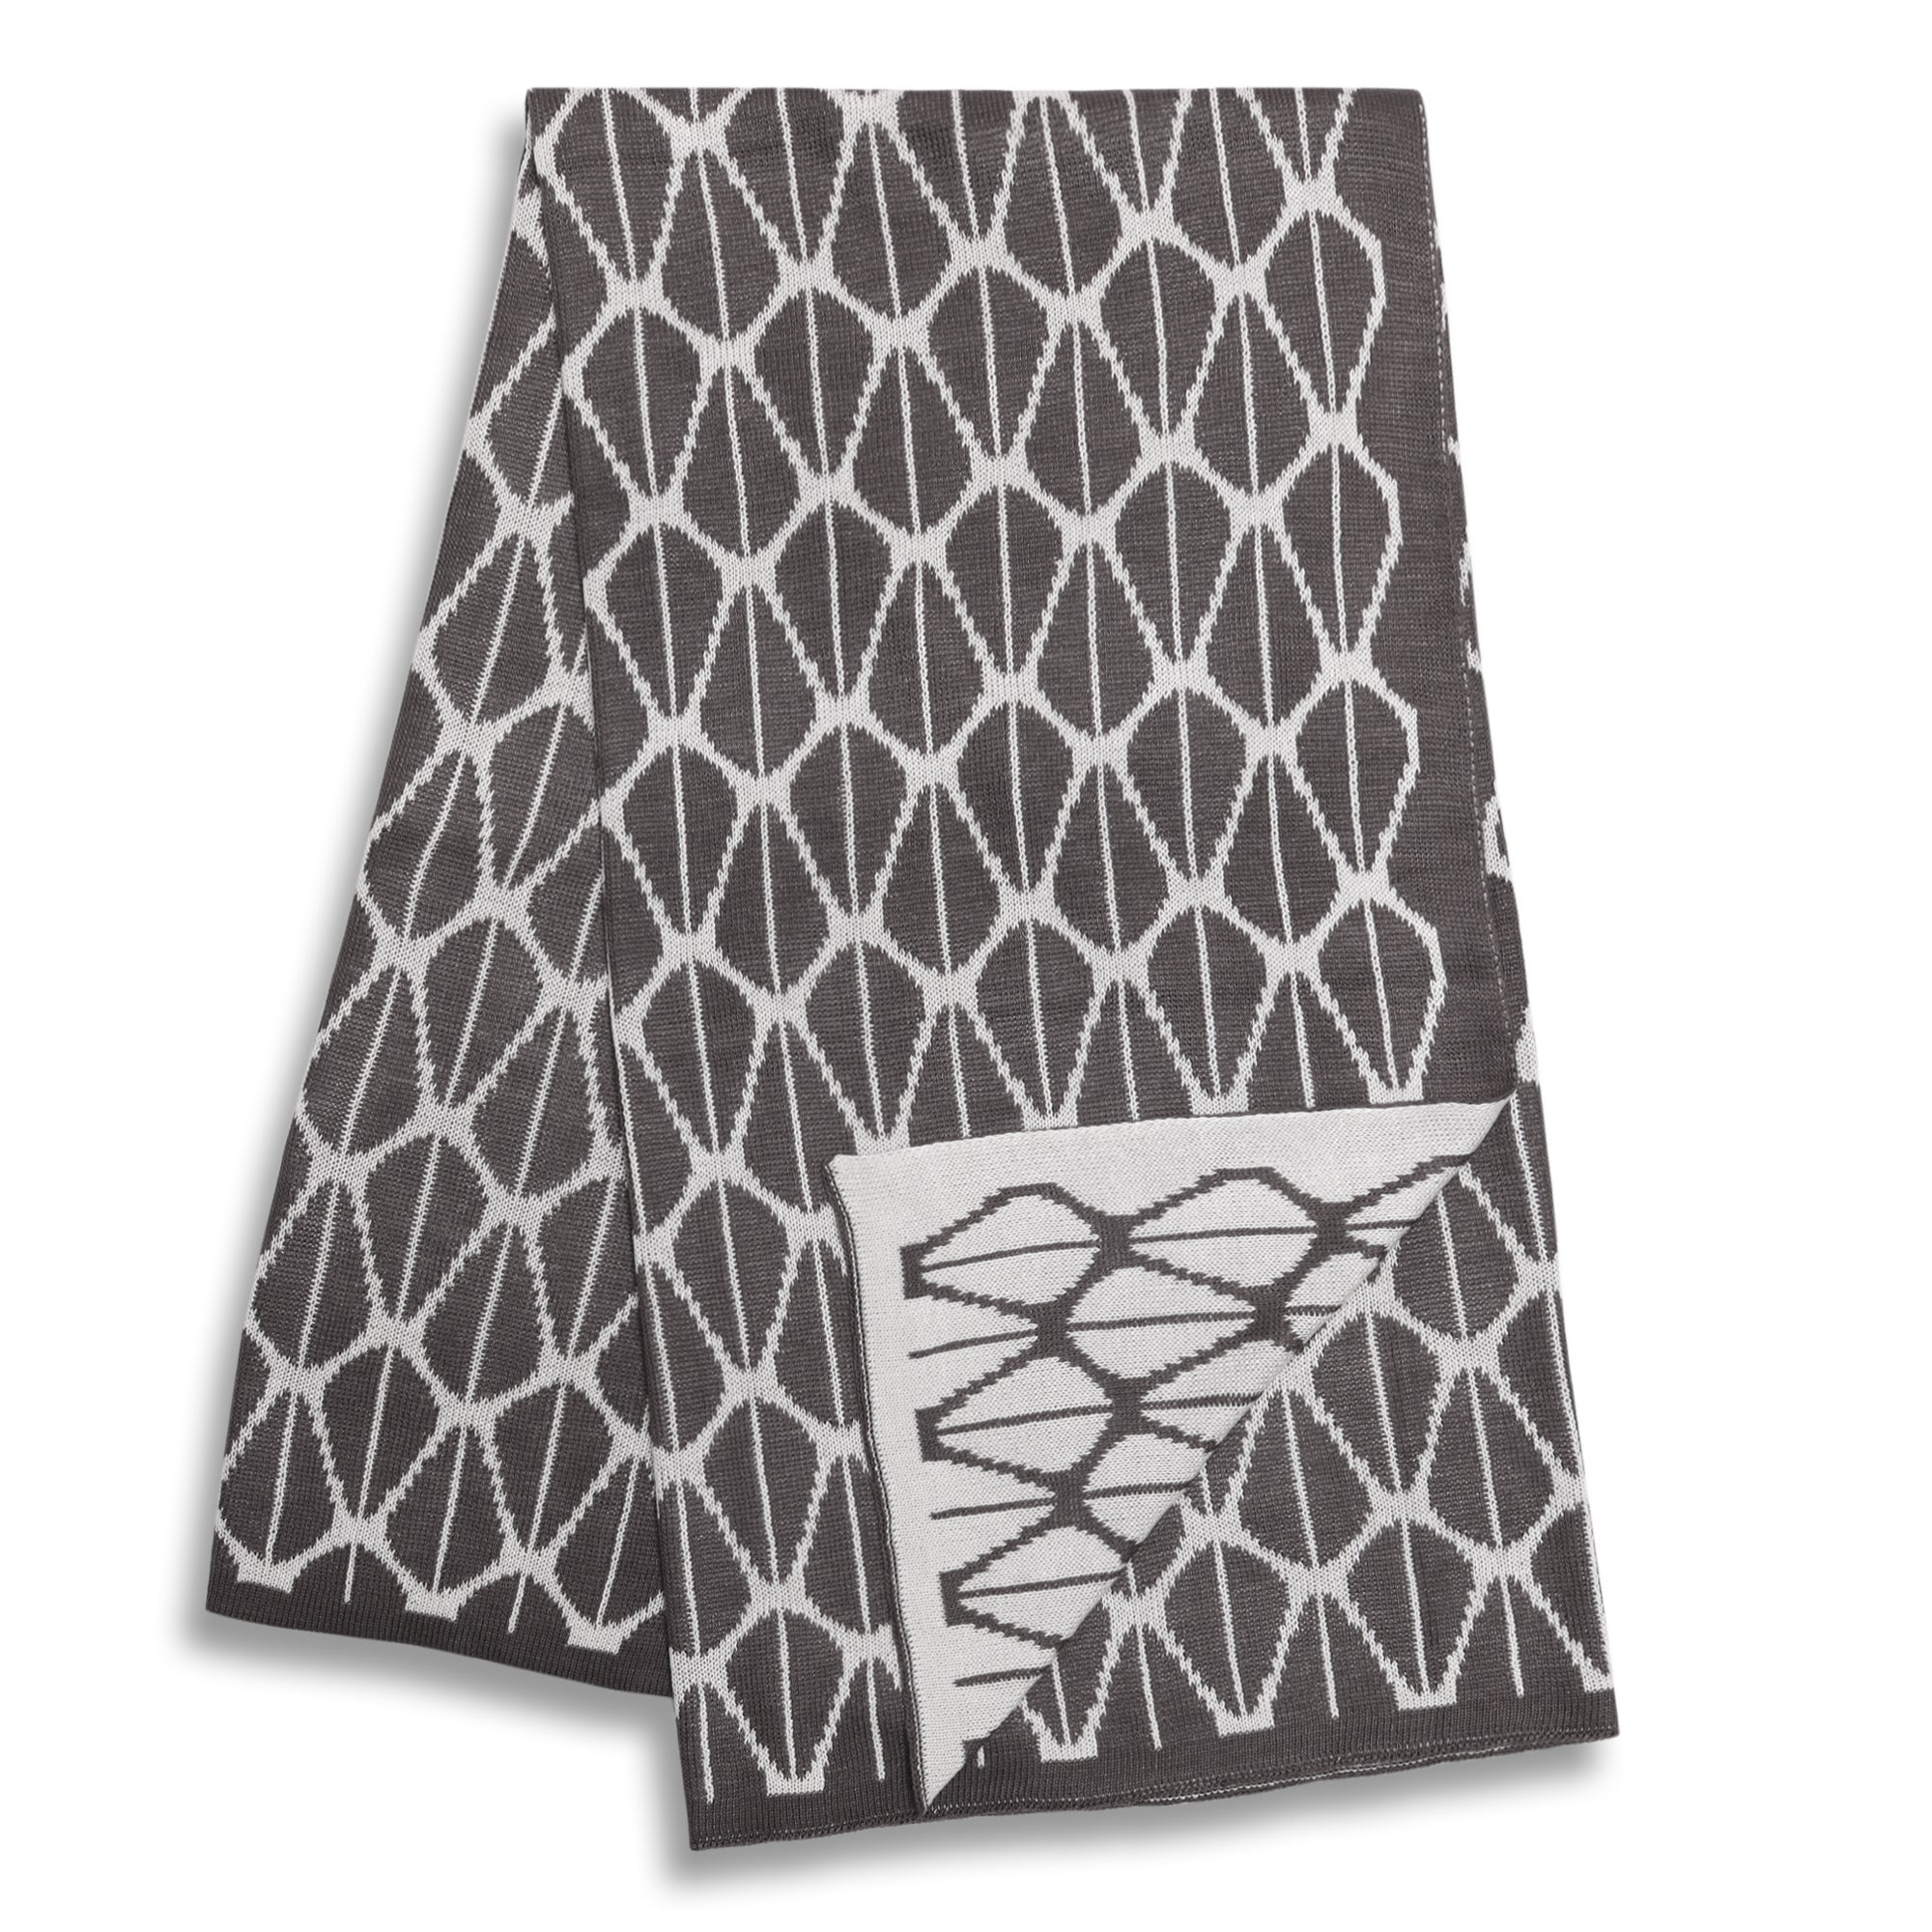 Peanut Shell Charcoal and White Reversible Blanket (Dark ...